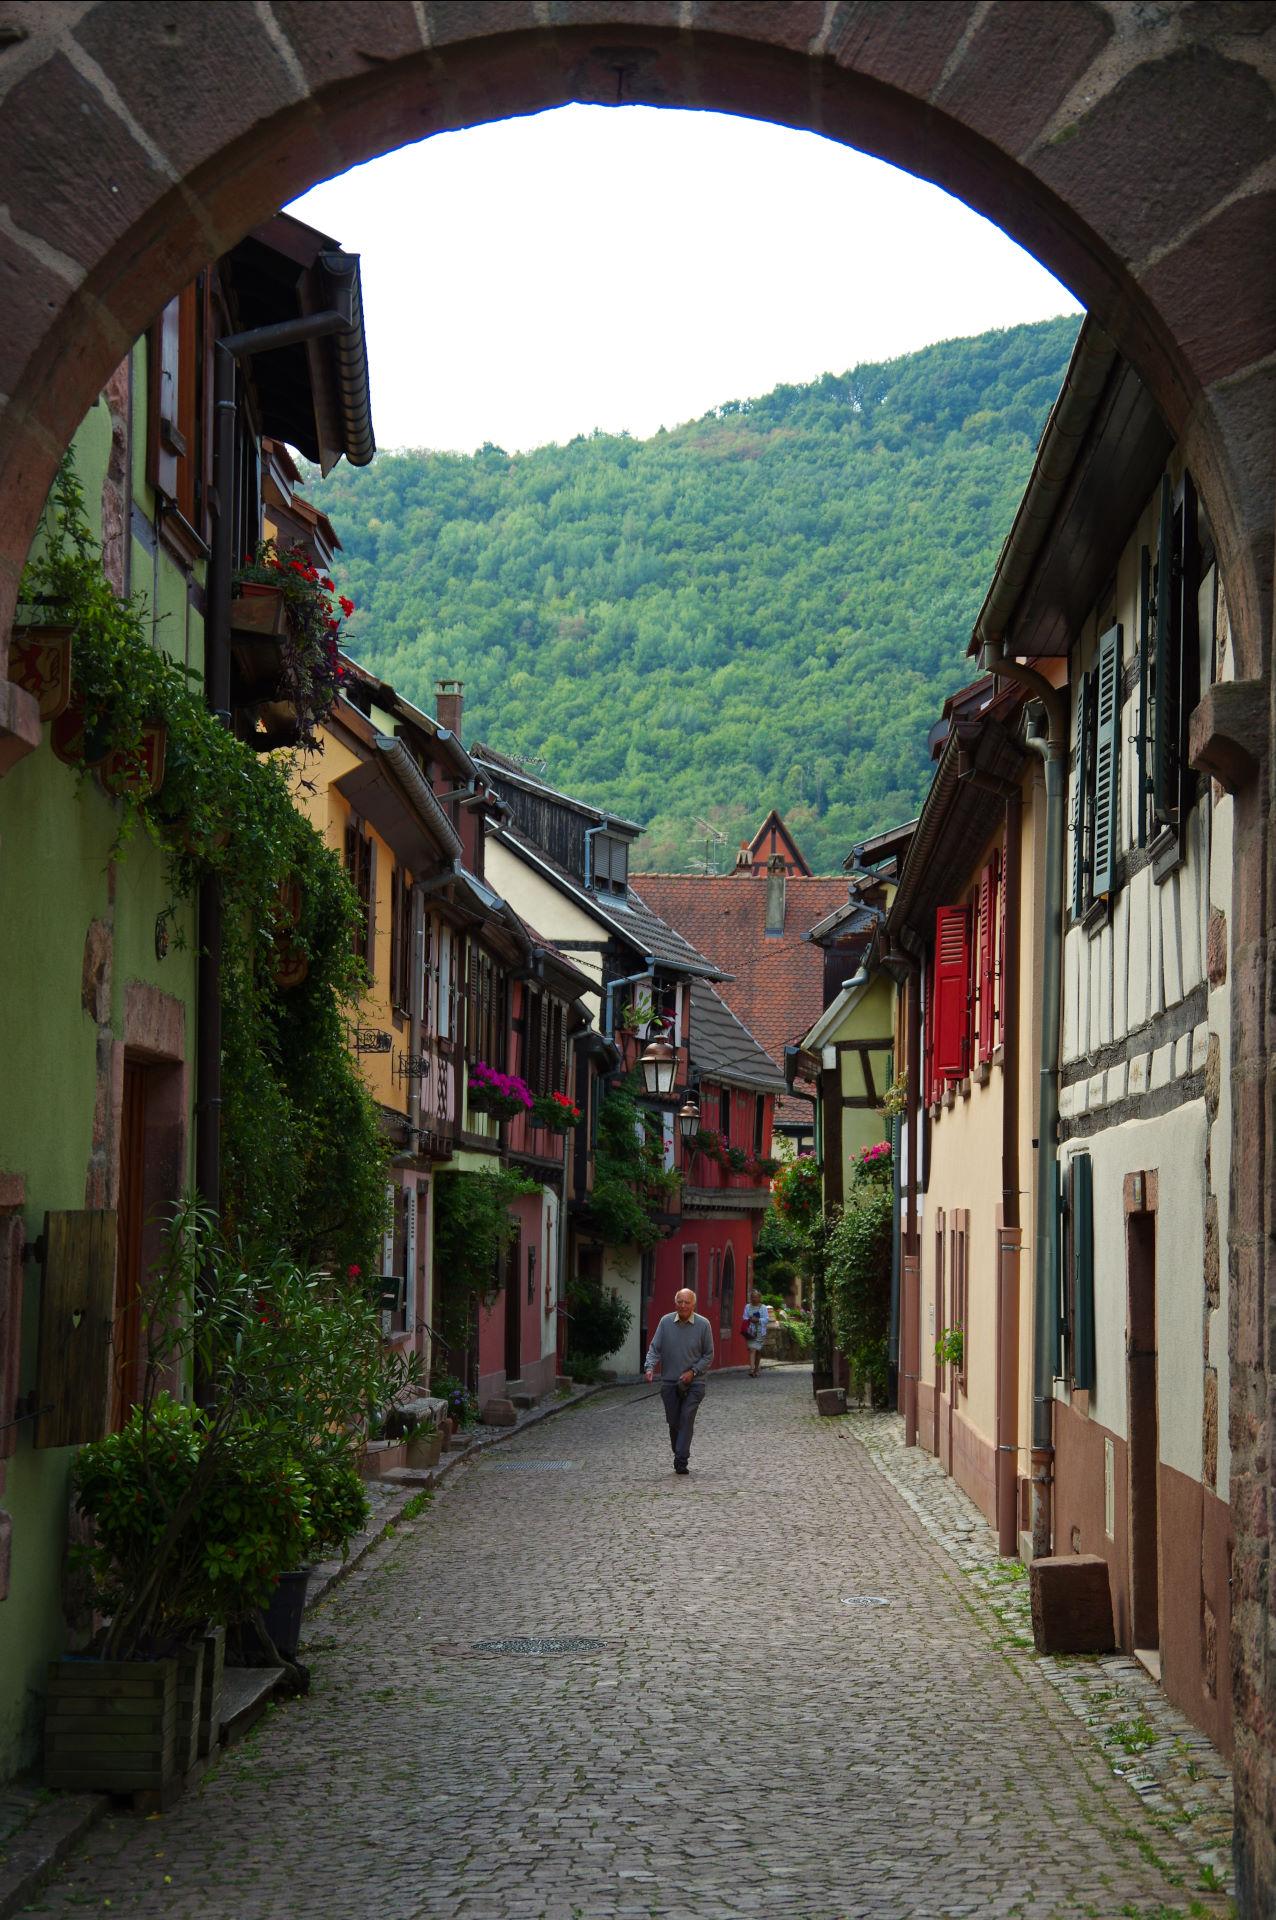 Frankrig 19.-20. august - Alsace og Kaysersberg